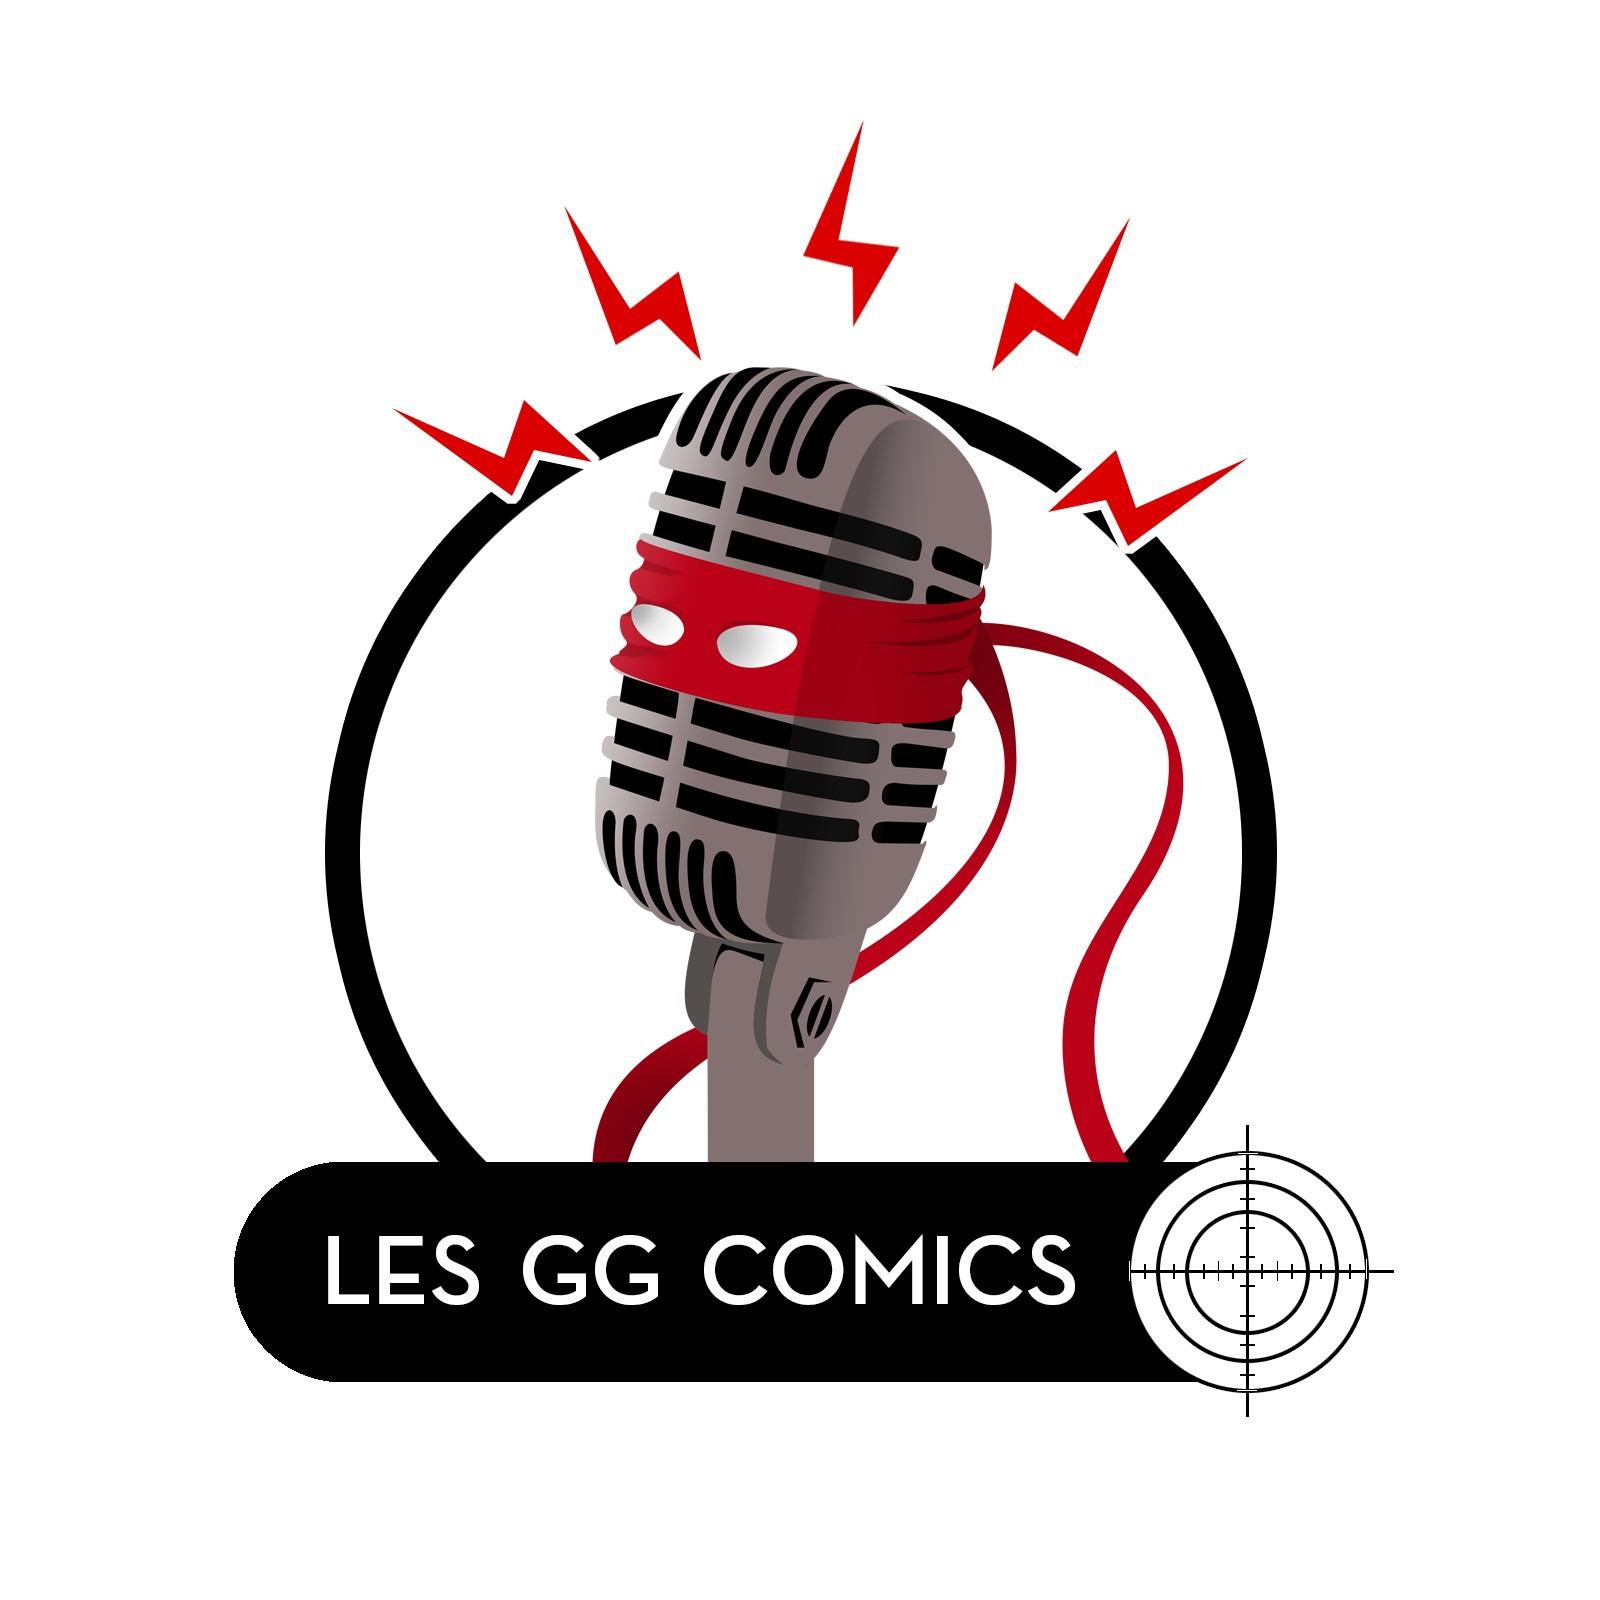 Les GG comics #64 : Le vieux gars Logan